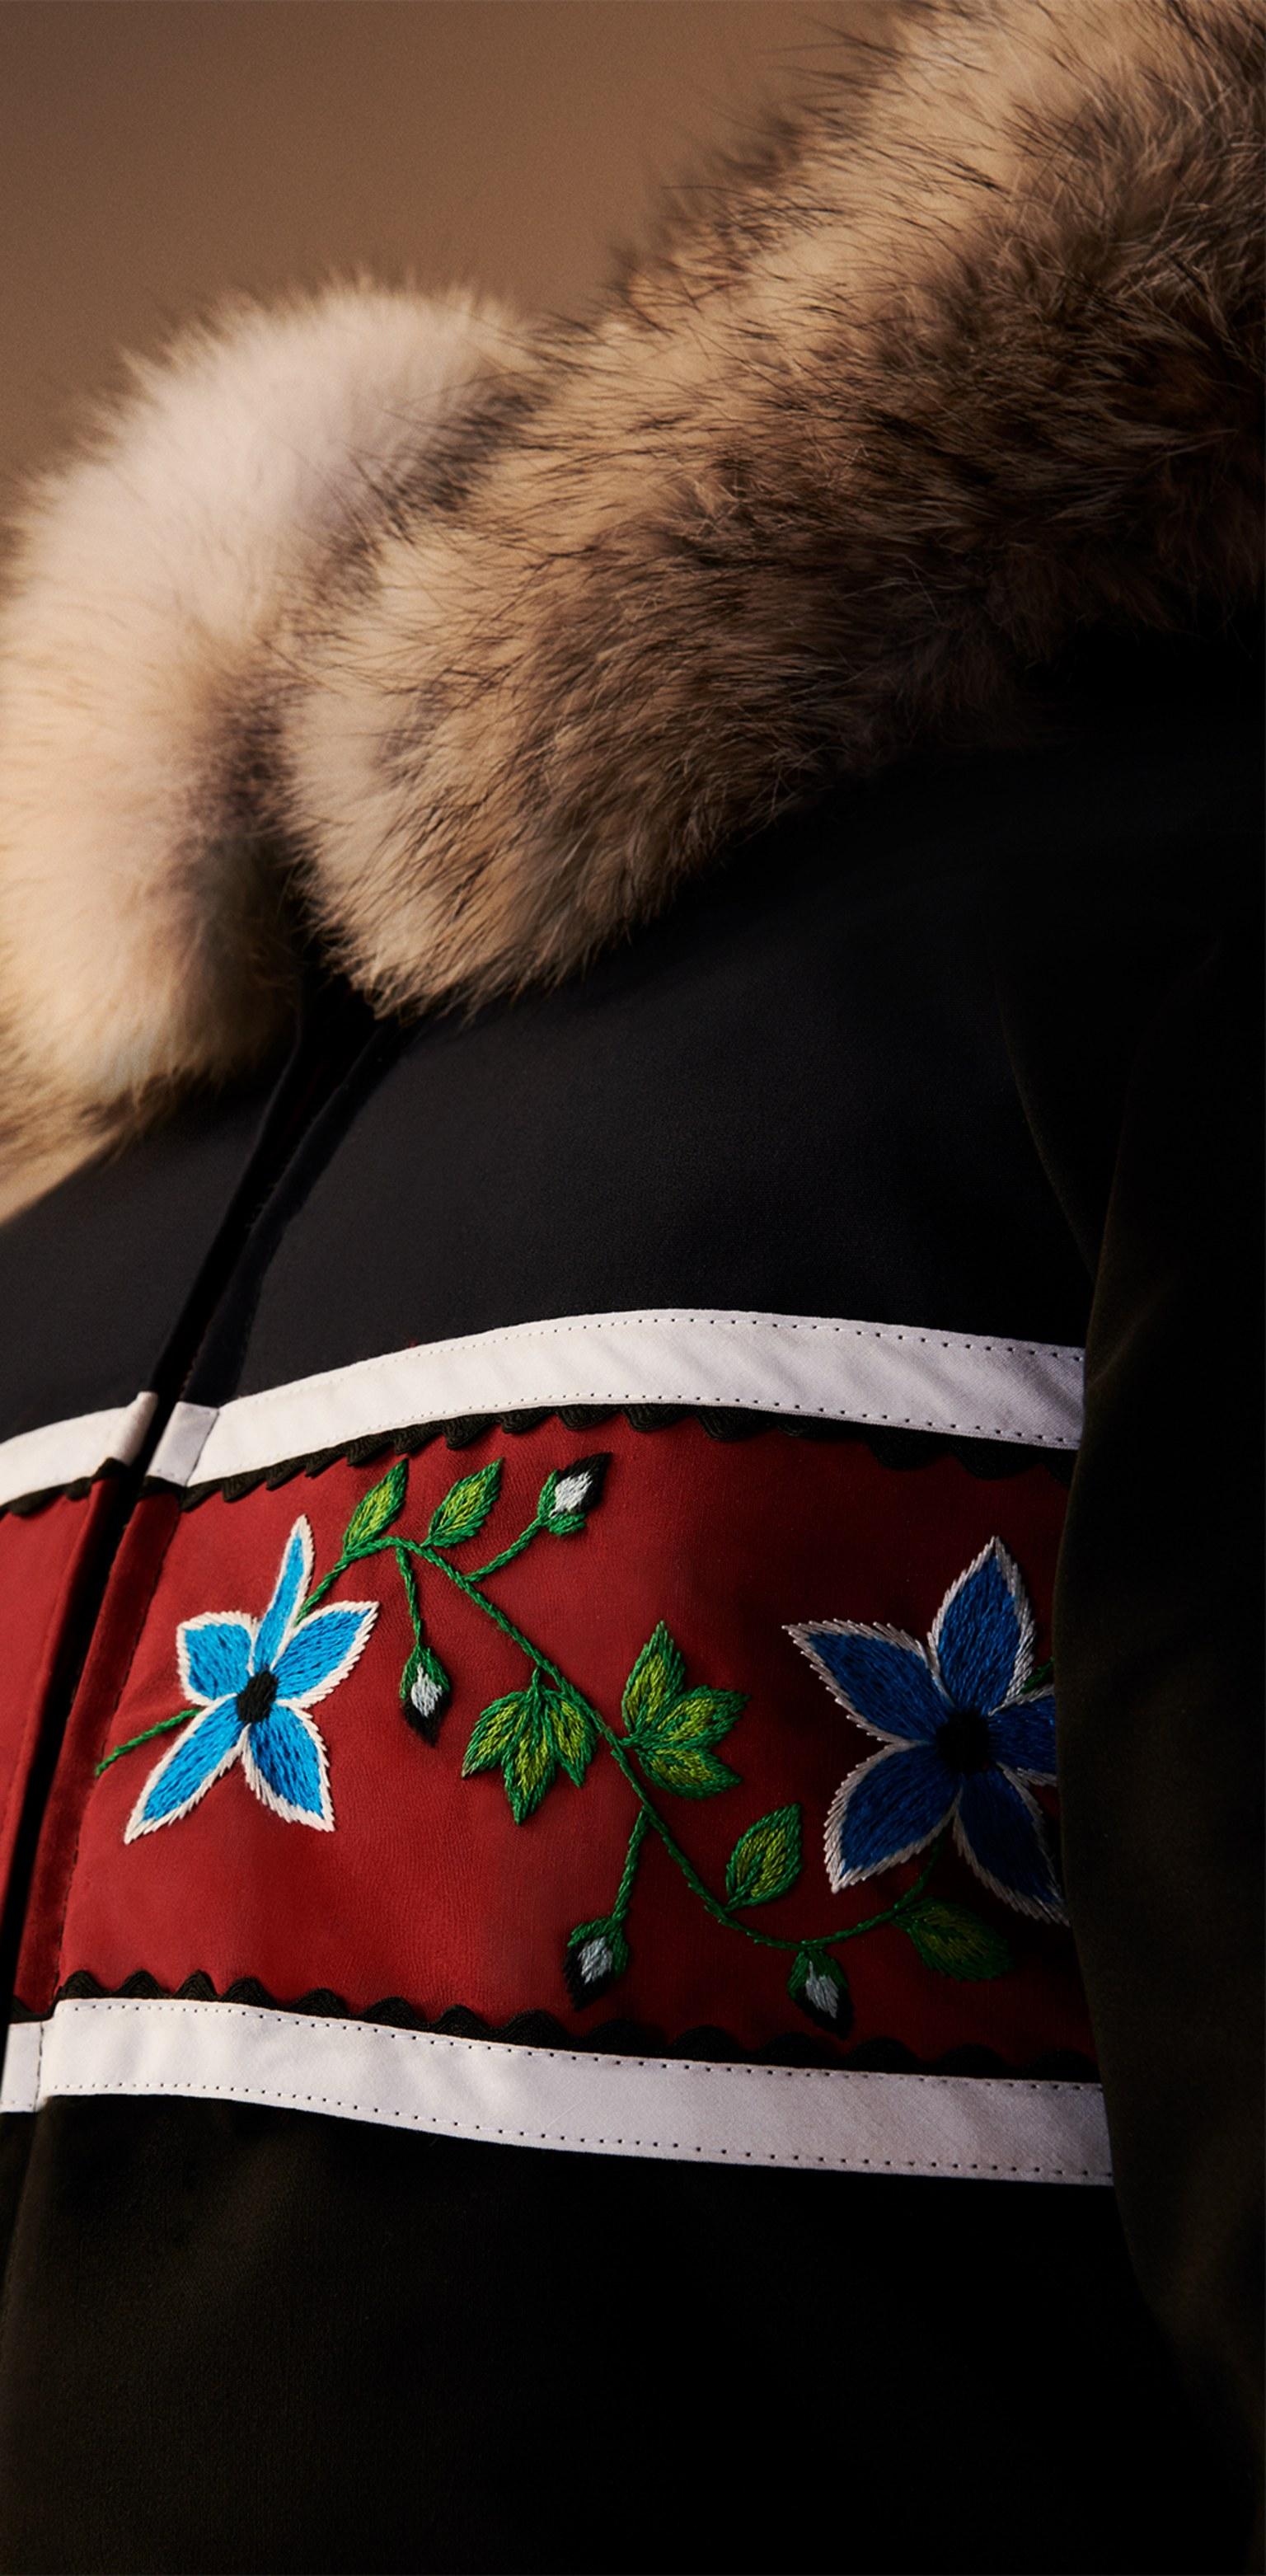 Blanche Winters | Canada Goose